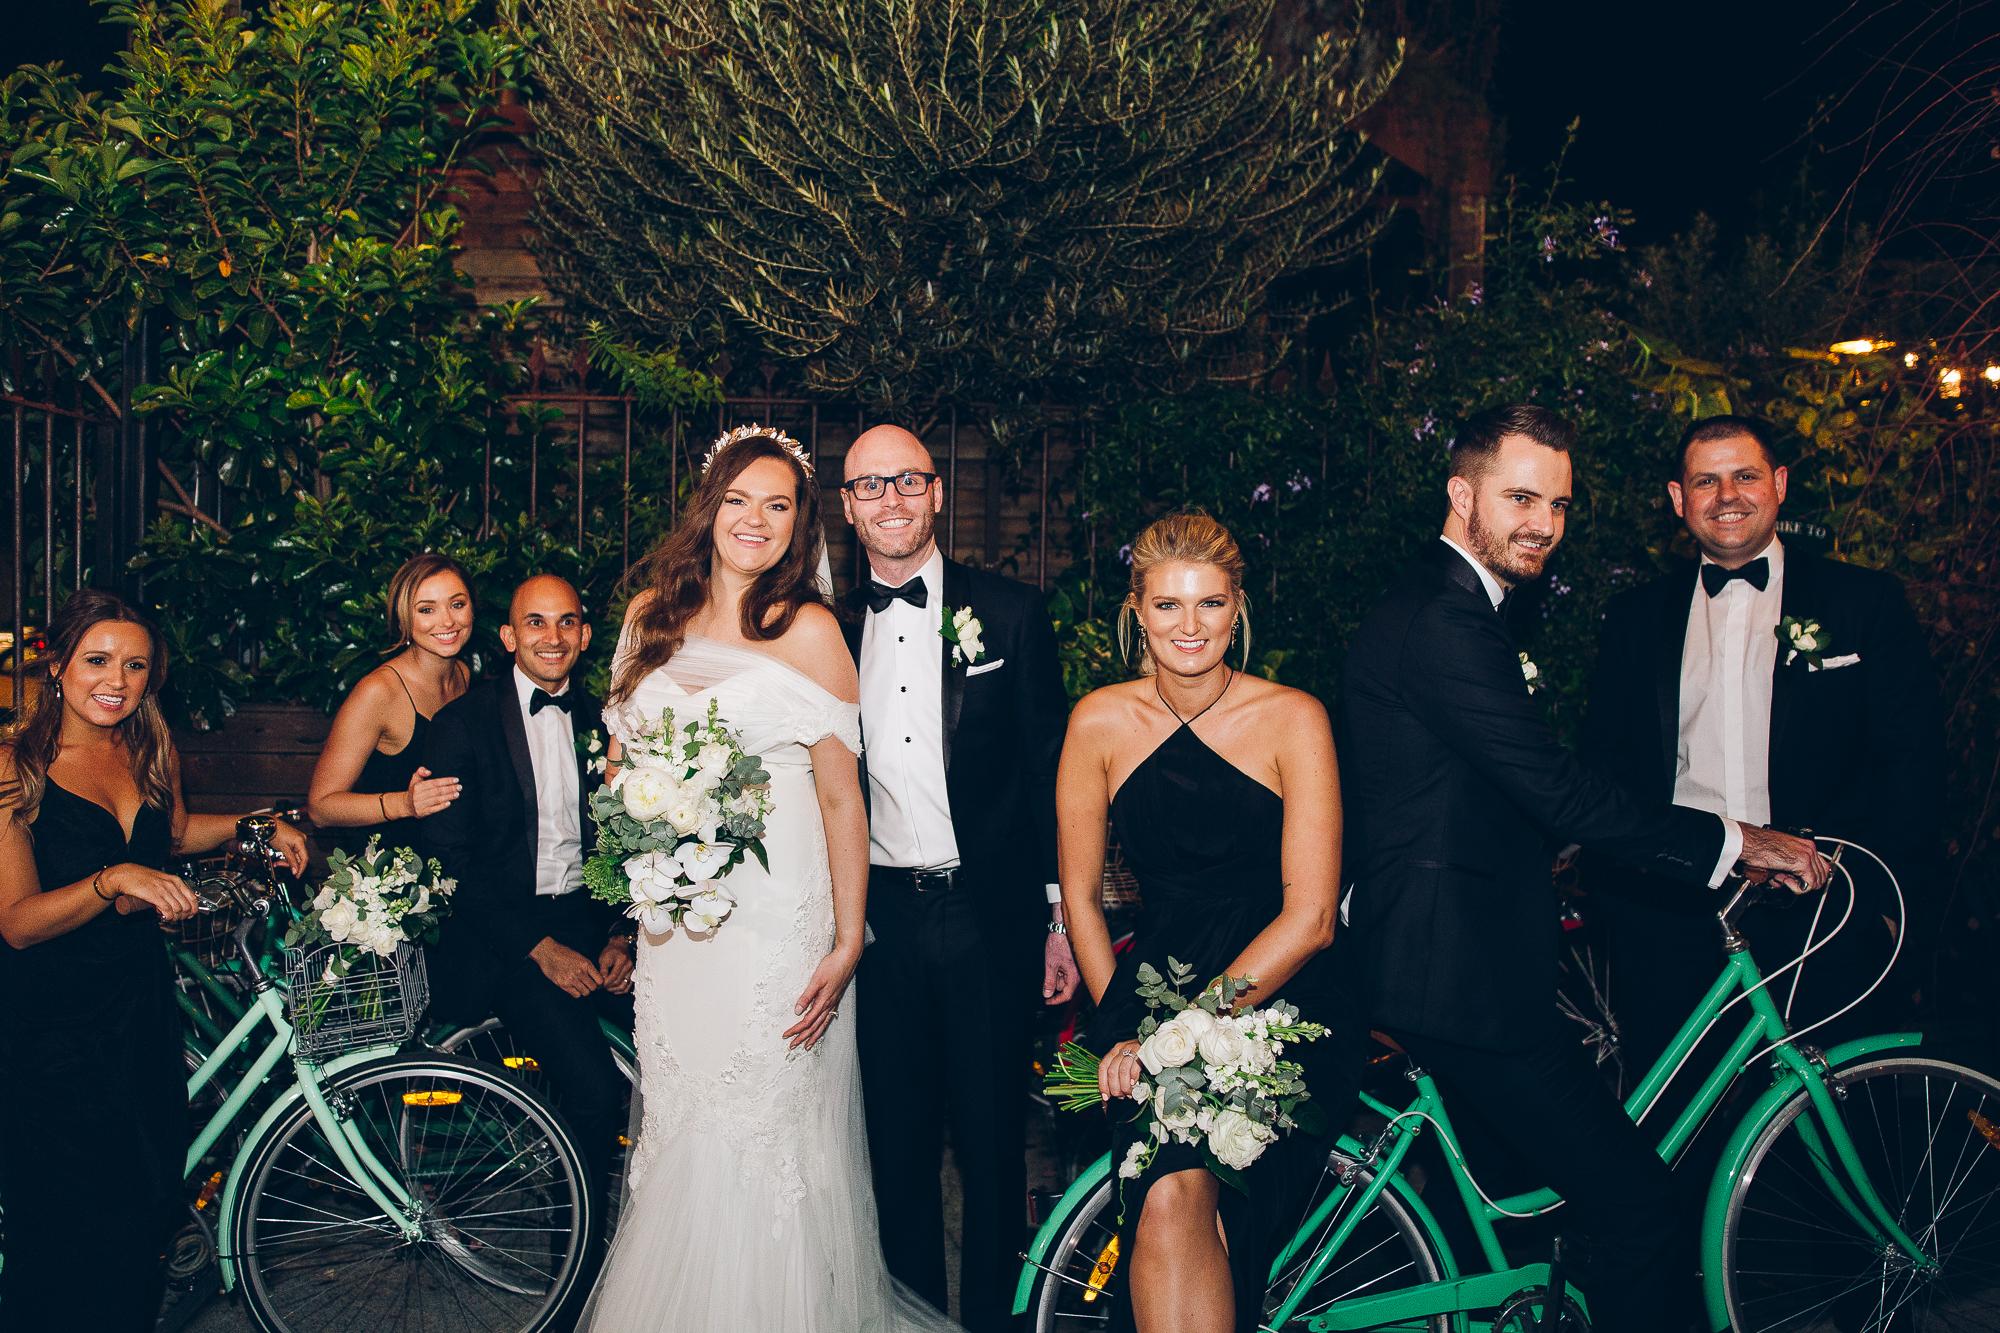 3009-Wedding-Location-The-Grounds-Nicole-Brad.jpg